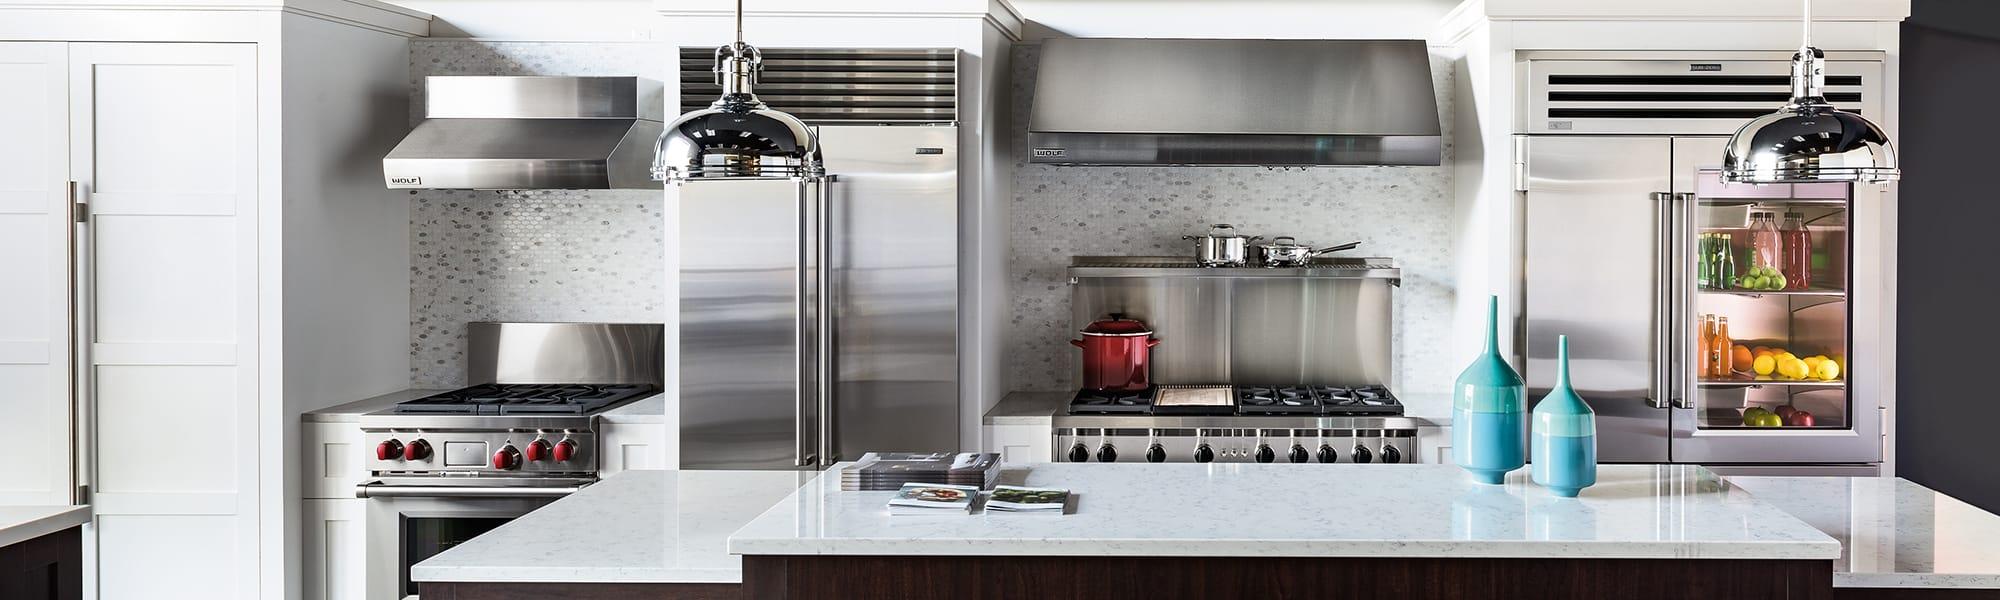 Subzero Wolf Living Kitchen Appliance Financing